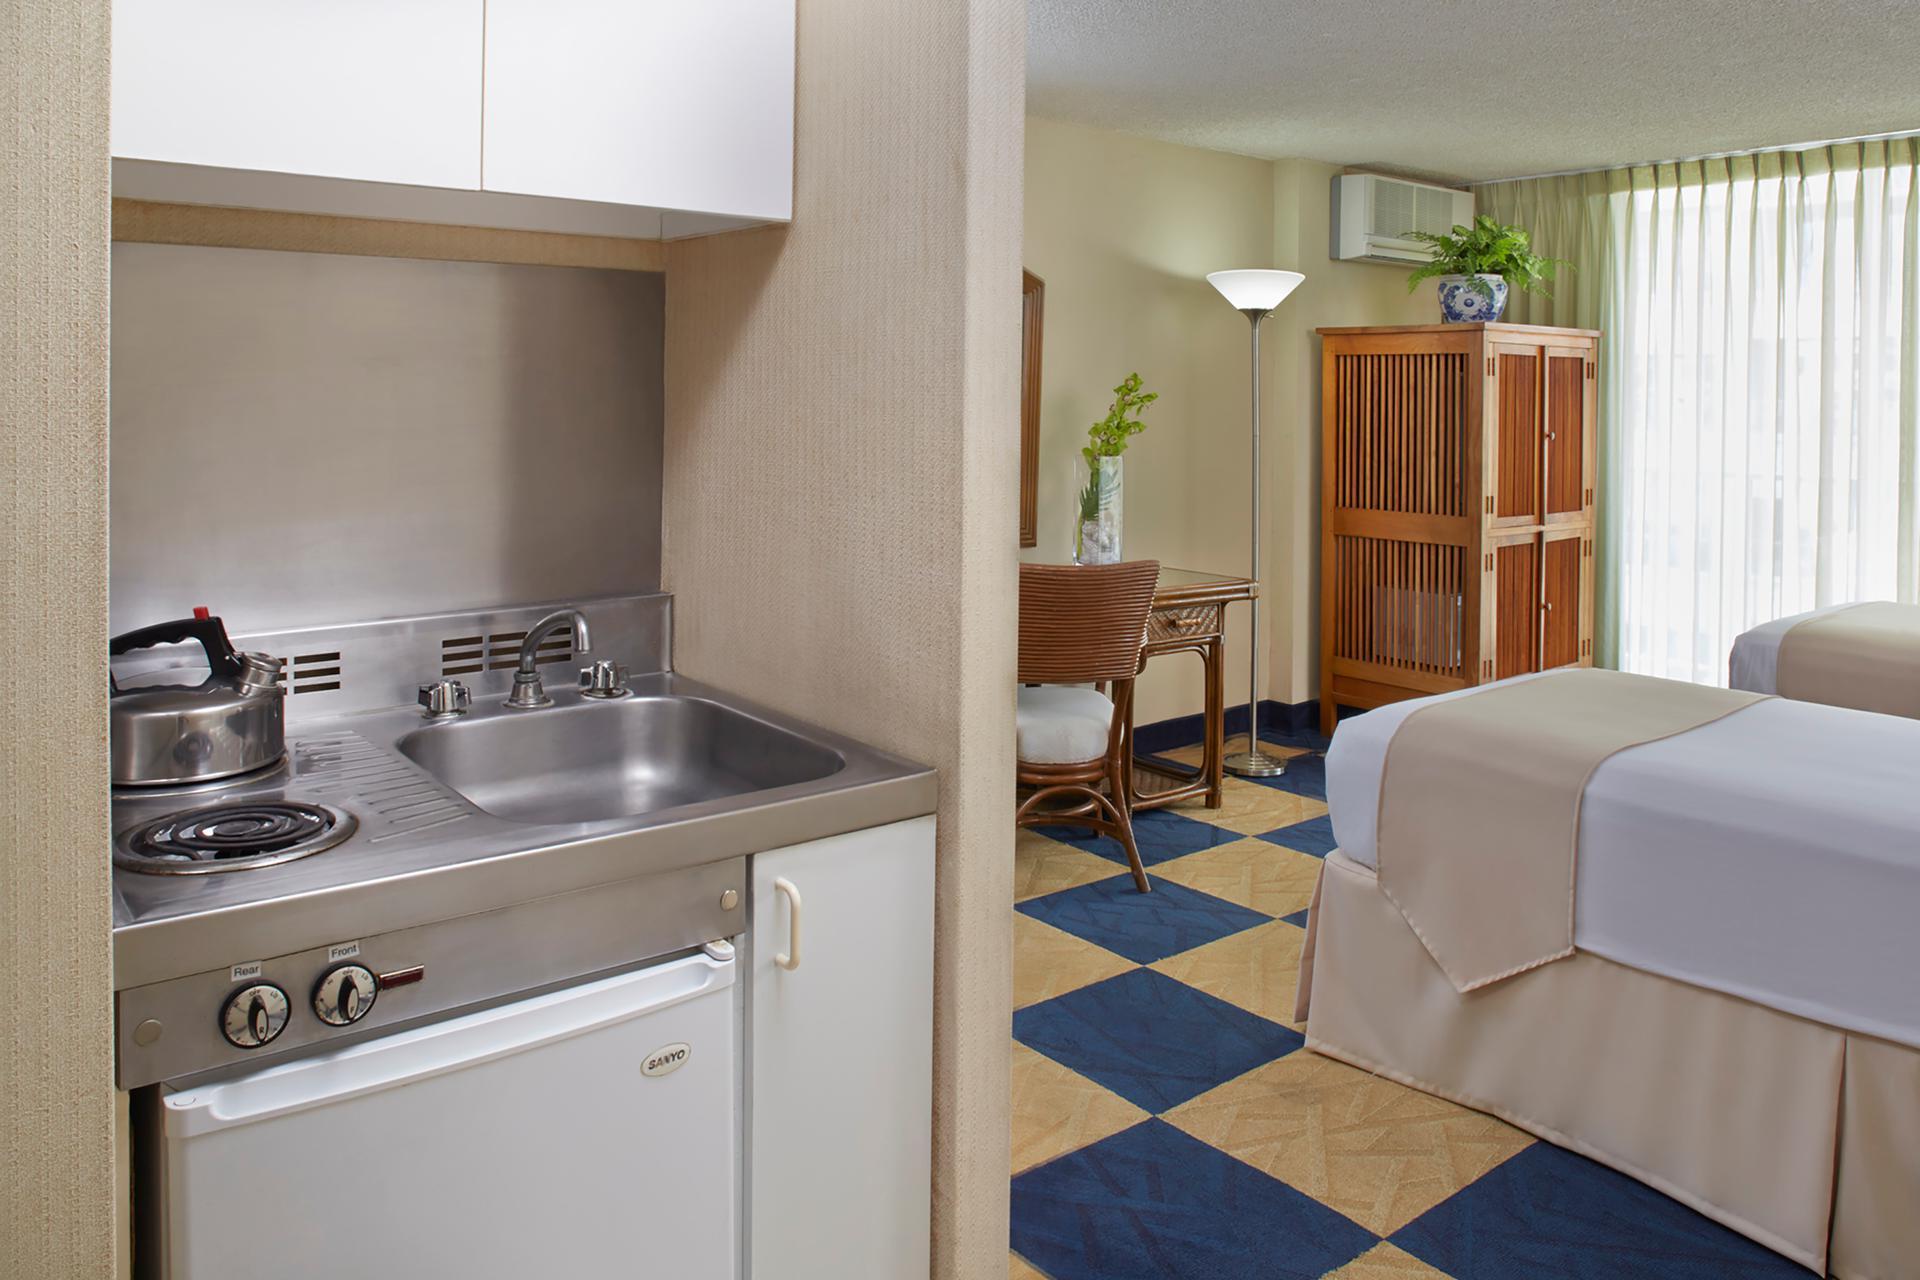 hotels with kitchenettes in waikiki wow blog